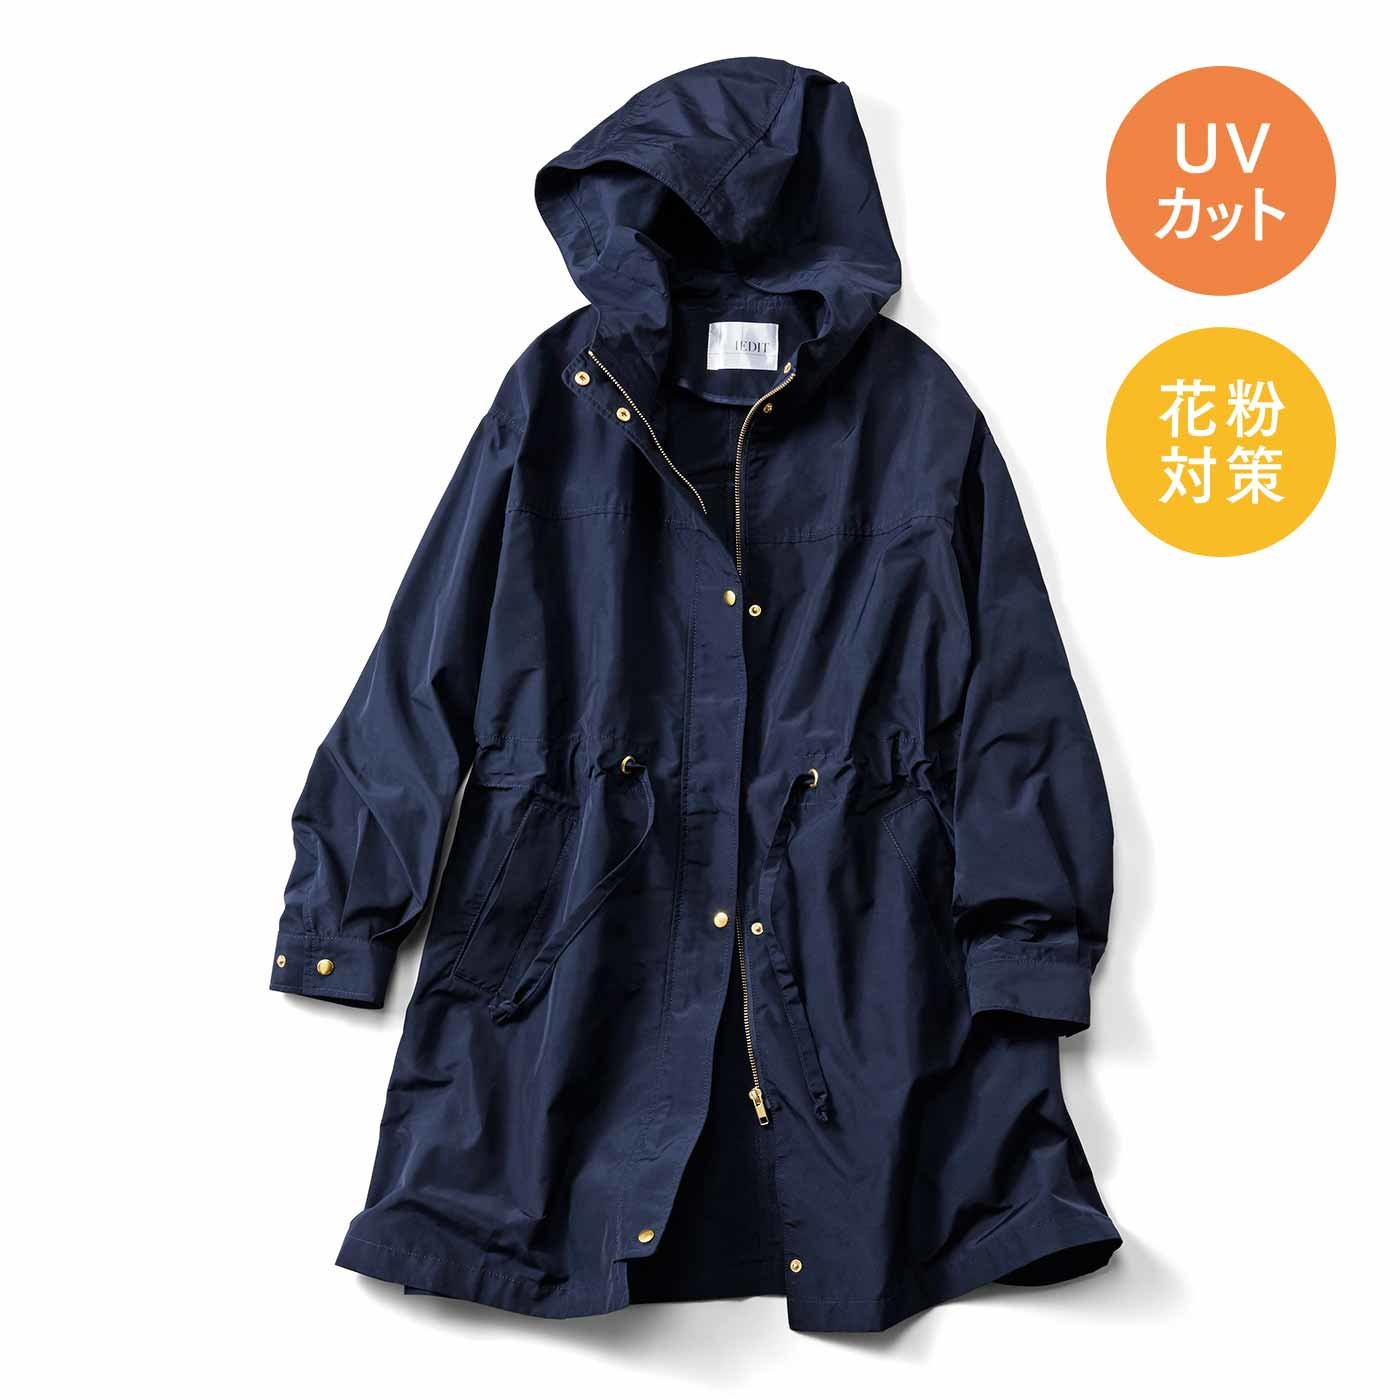 IEDIT[イディット] 花粉が付きにくい 背負えて便利なミドル丈フーデッドコート〈ネイビー〉